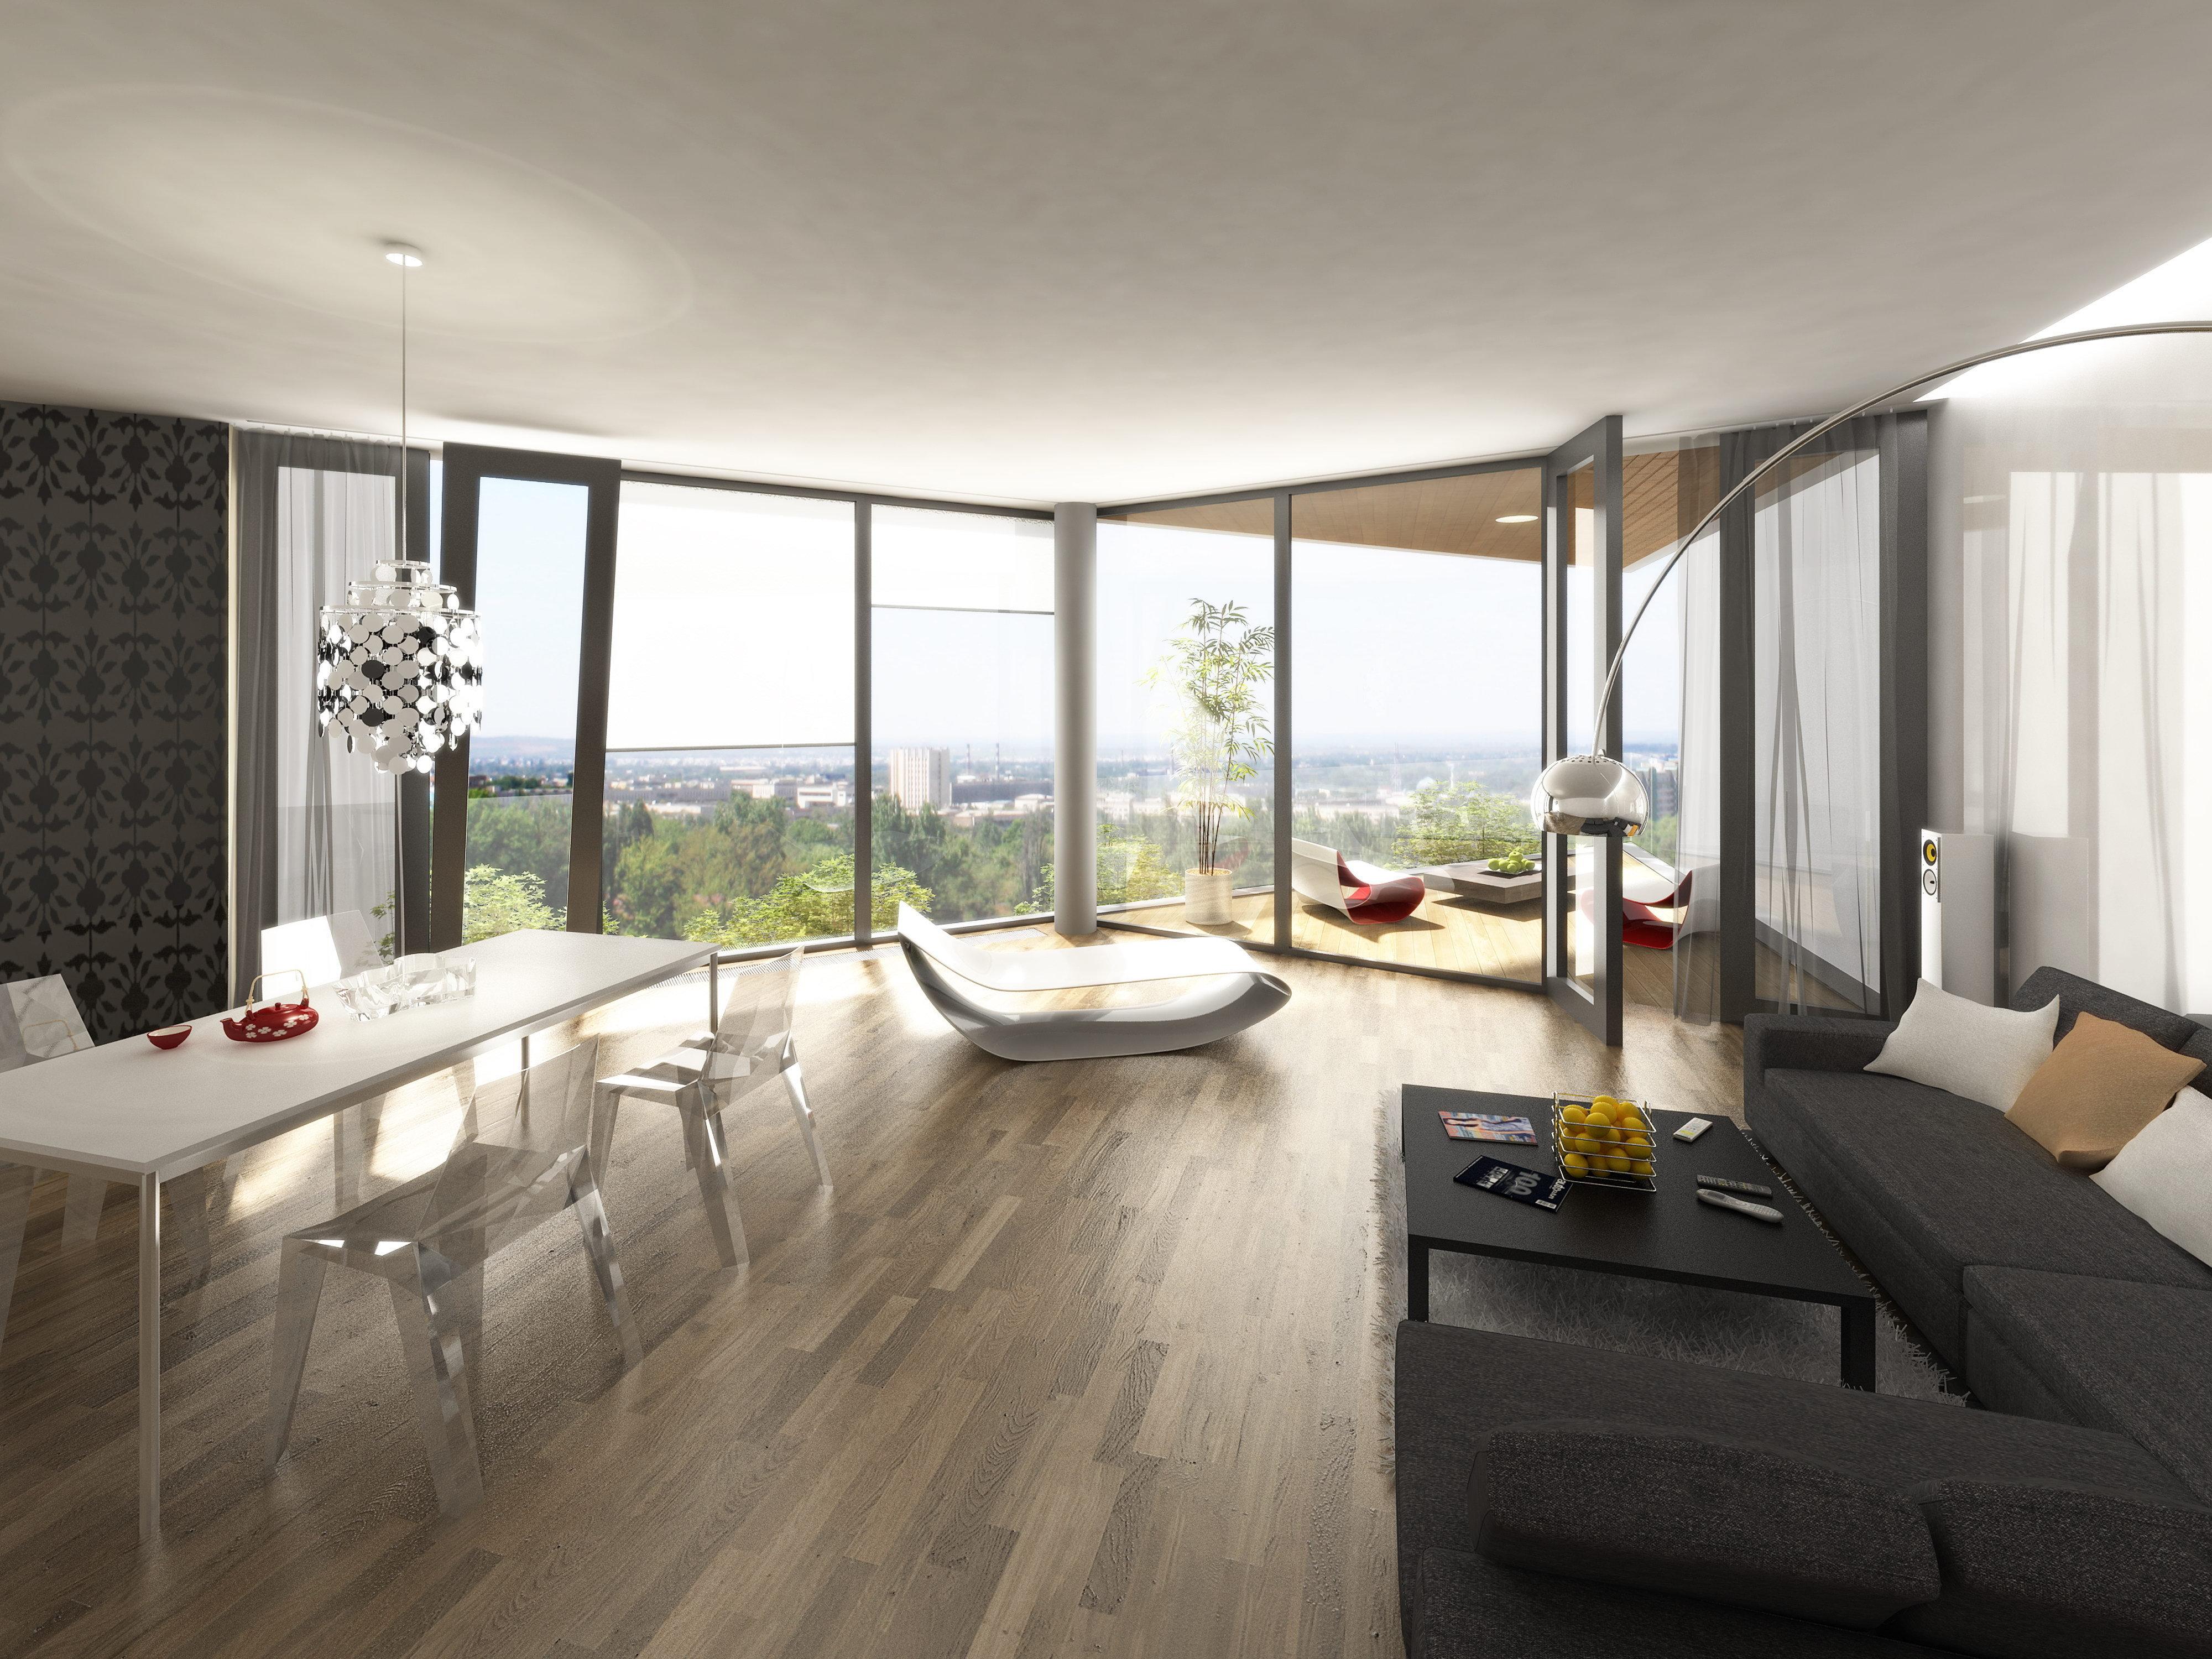 _____black_and_white_apartment_design_093420_